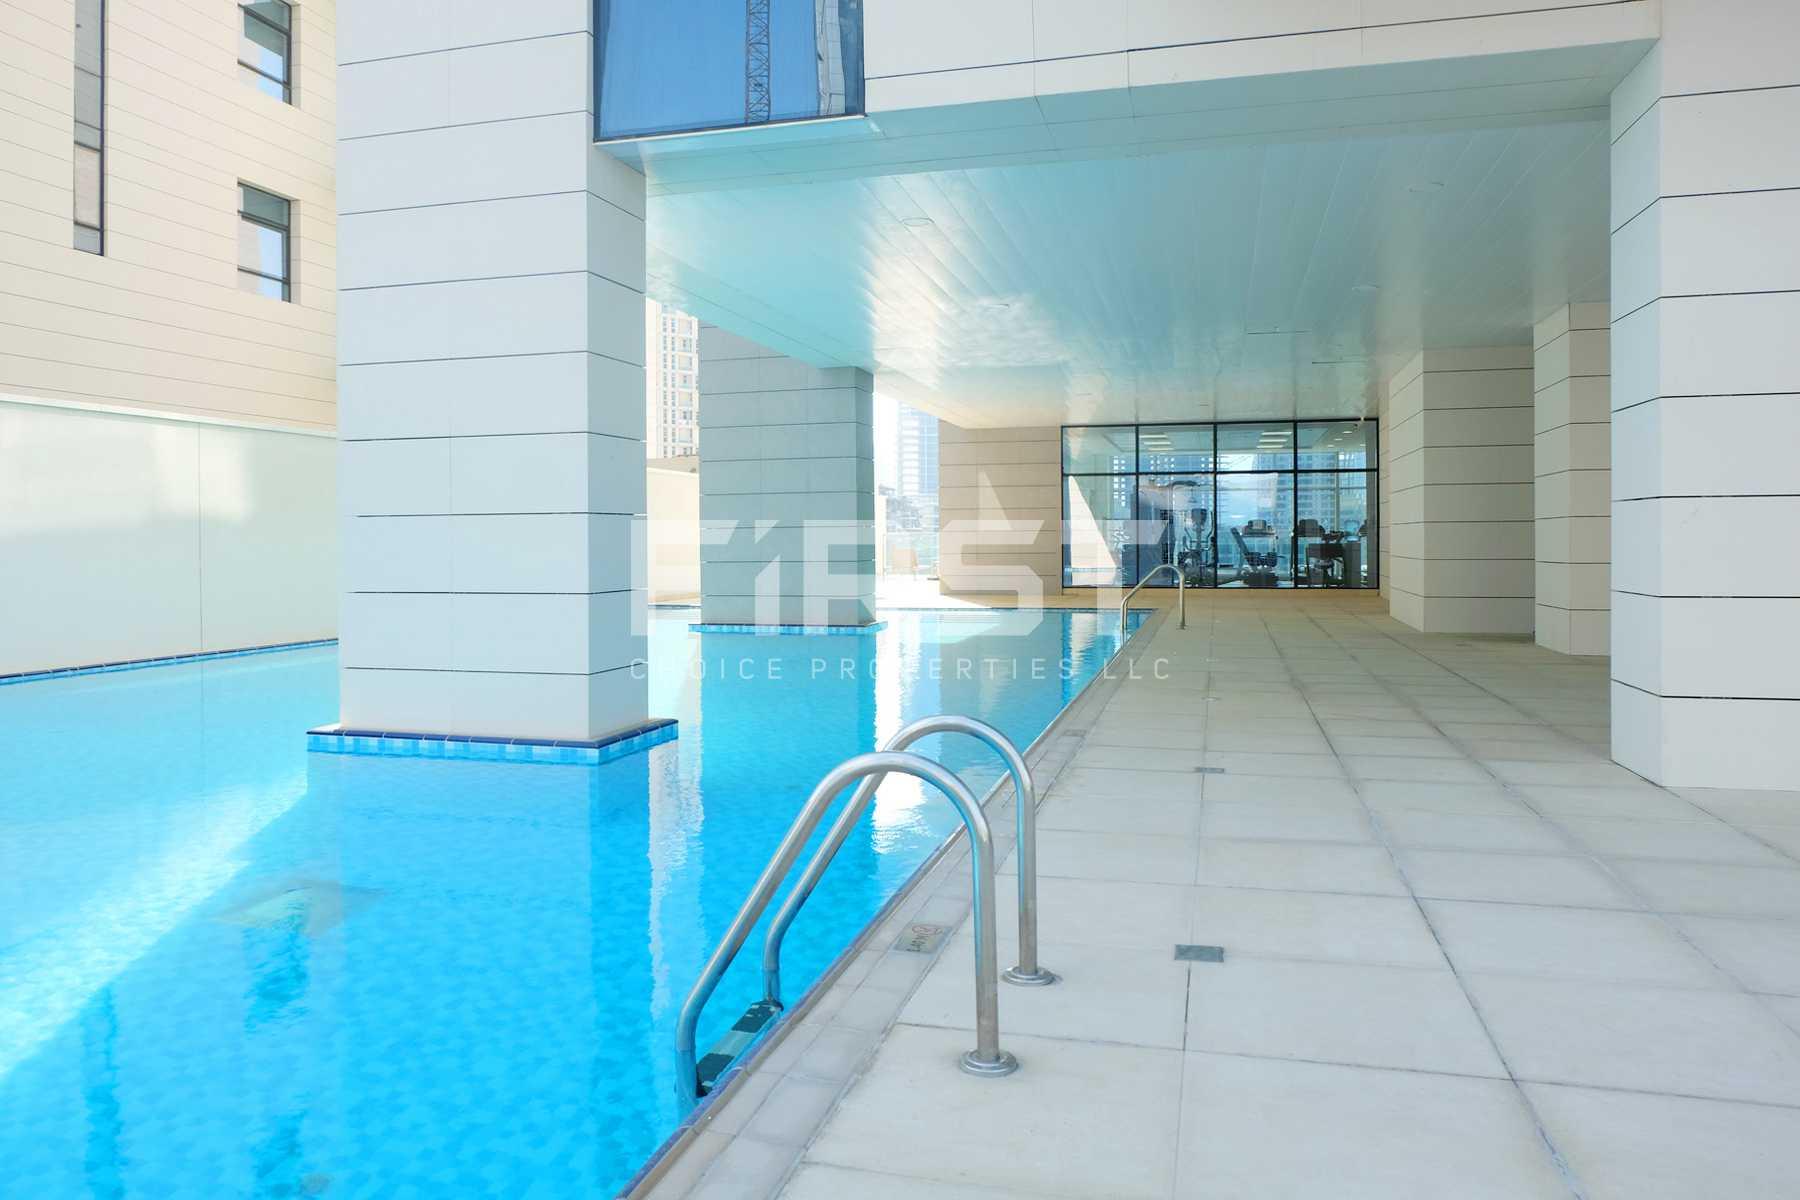 Internal Photo of Parkside Residence Shams Abu Dhabi UAE (14).jpg